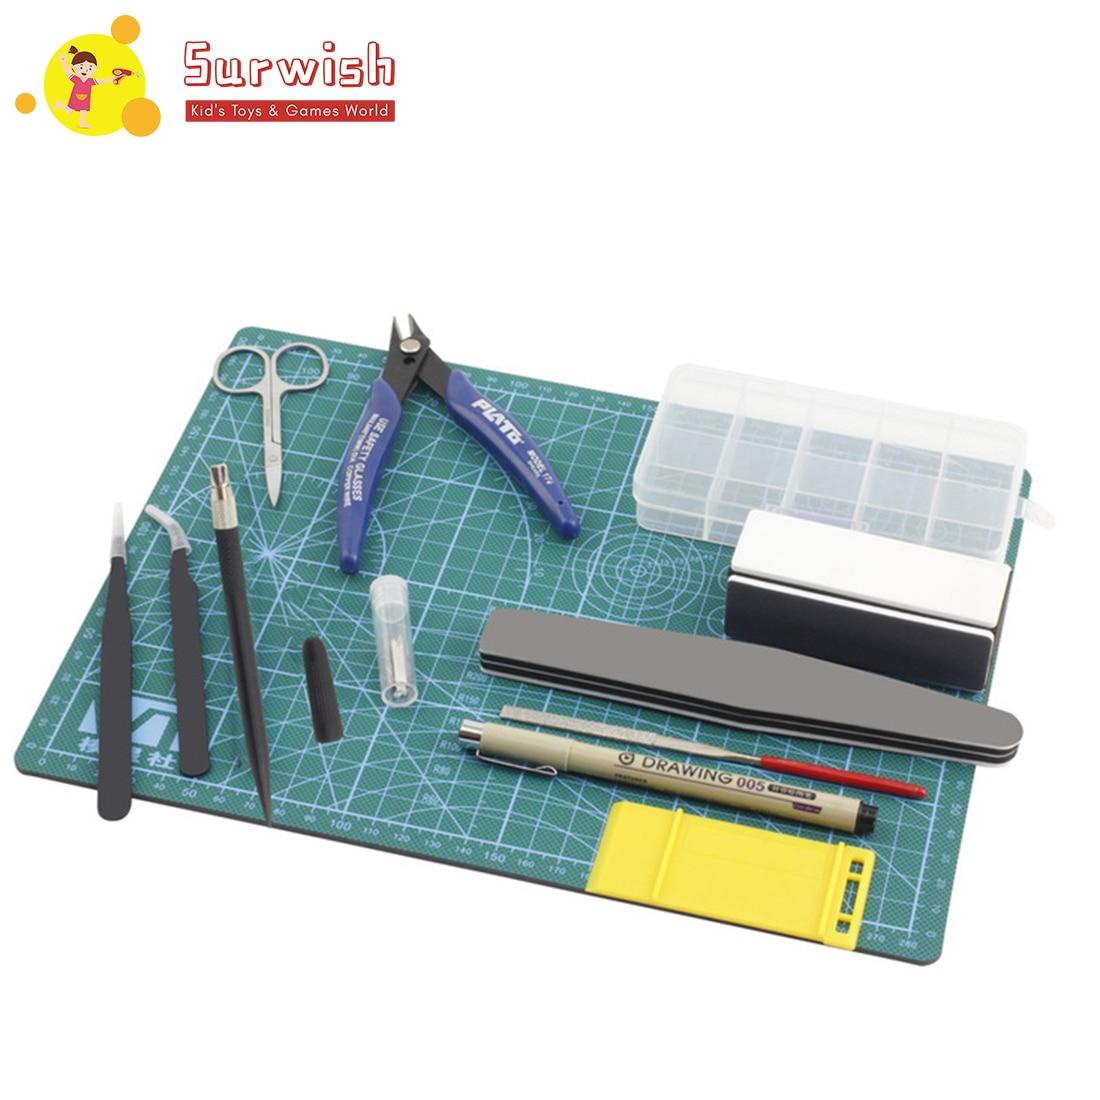 Suriwsh 7pcs/set For Gundam Model Tools Kit Modeler Basic Tools Craft Set Hobby Building Tools Kit Hot Sale